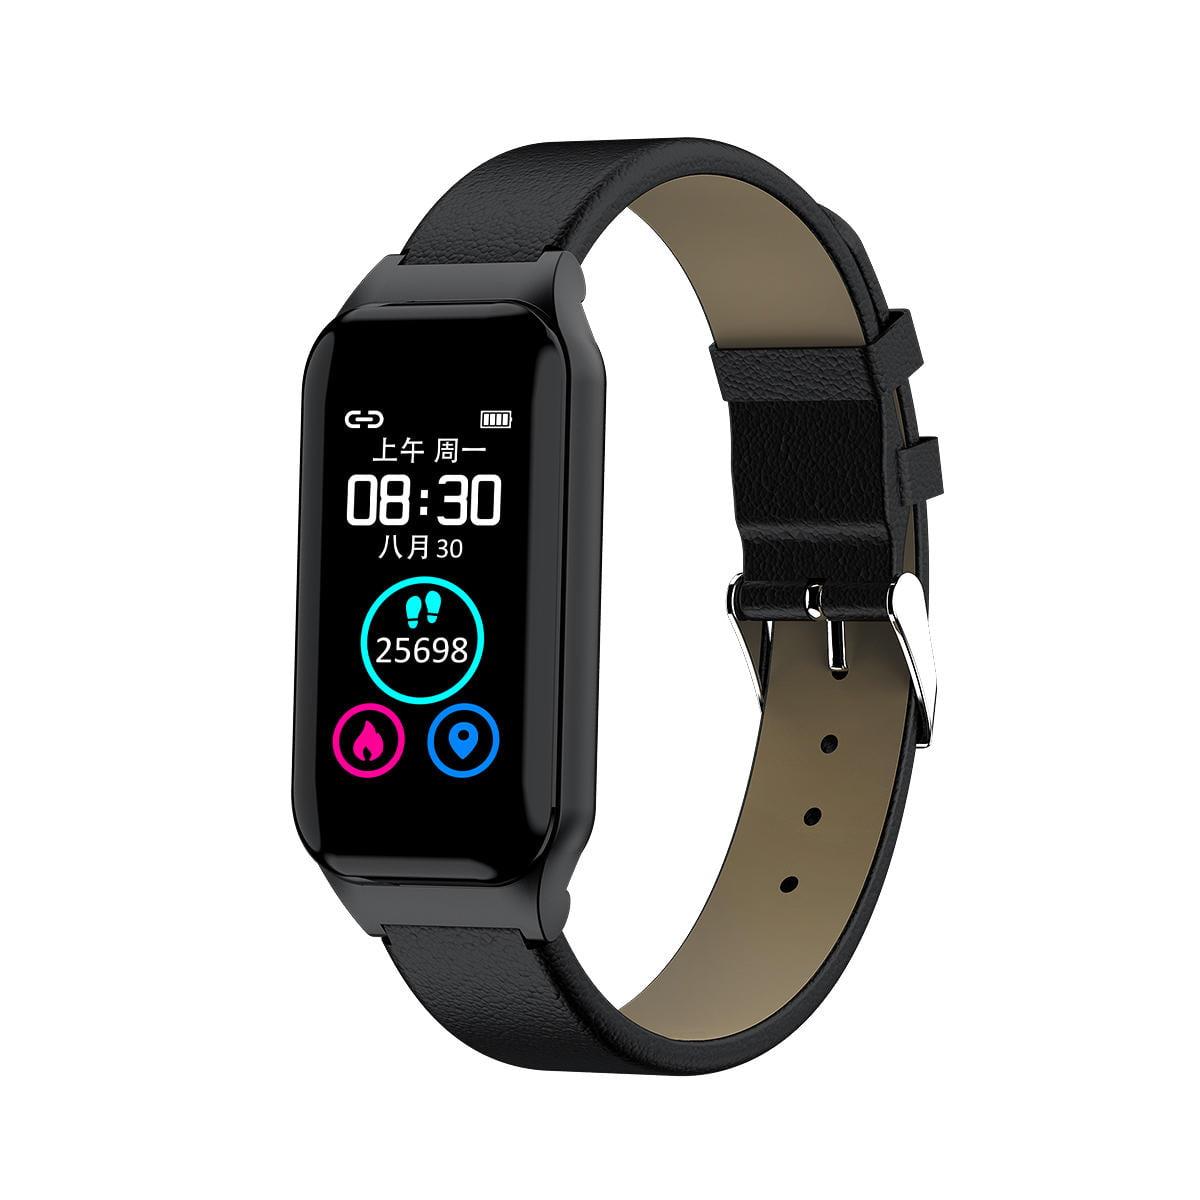 L818 bt5.0 intelligent noise reduction wireless earphone wristband (24)